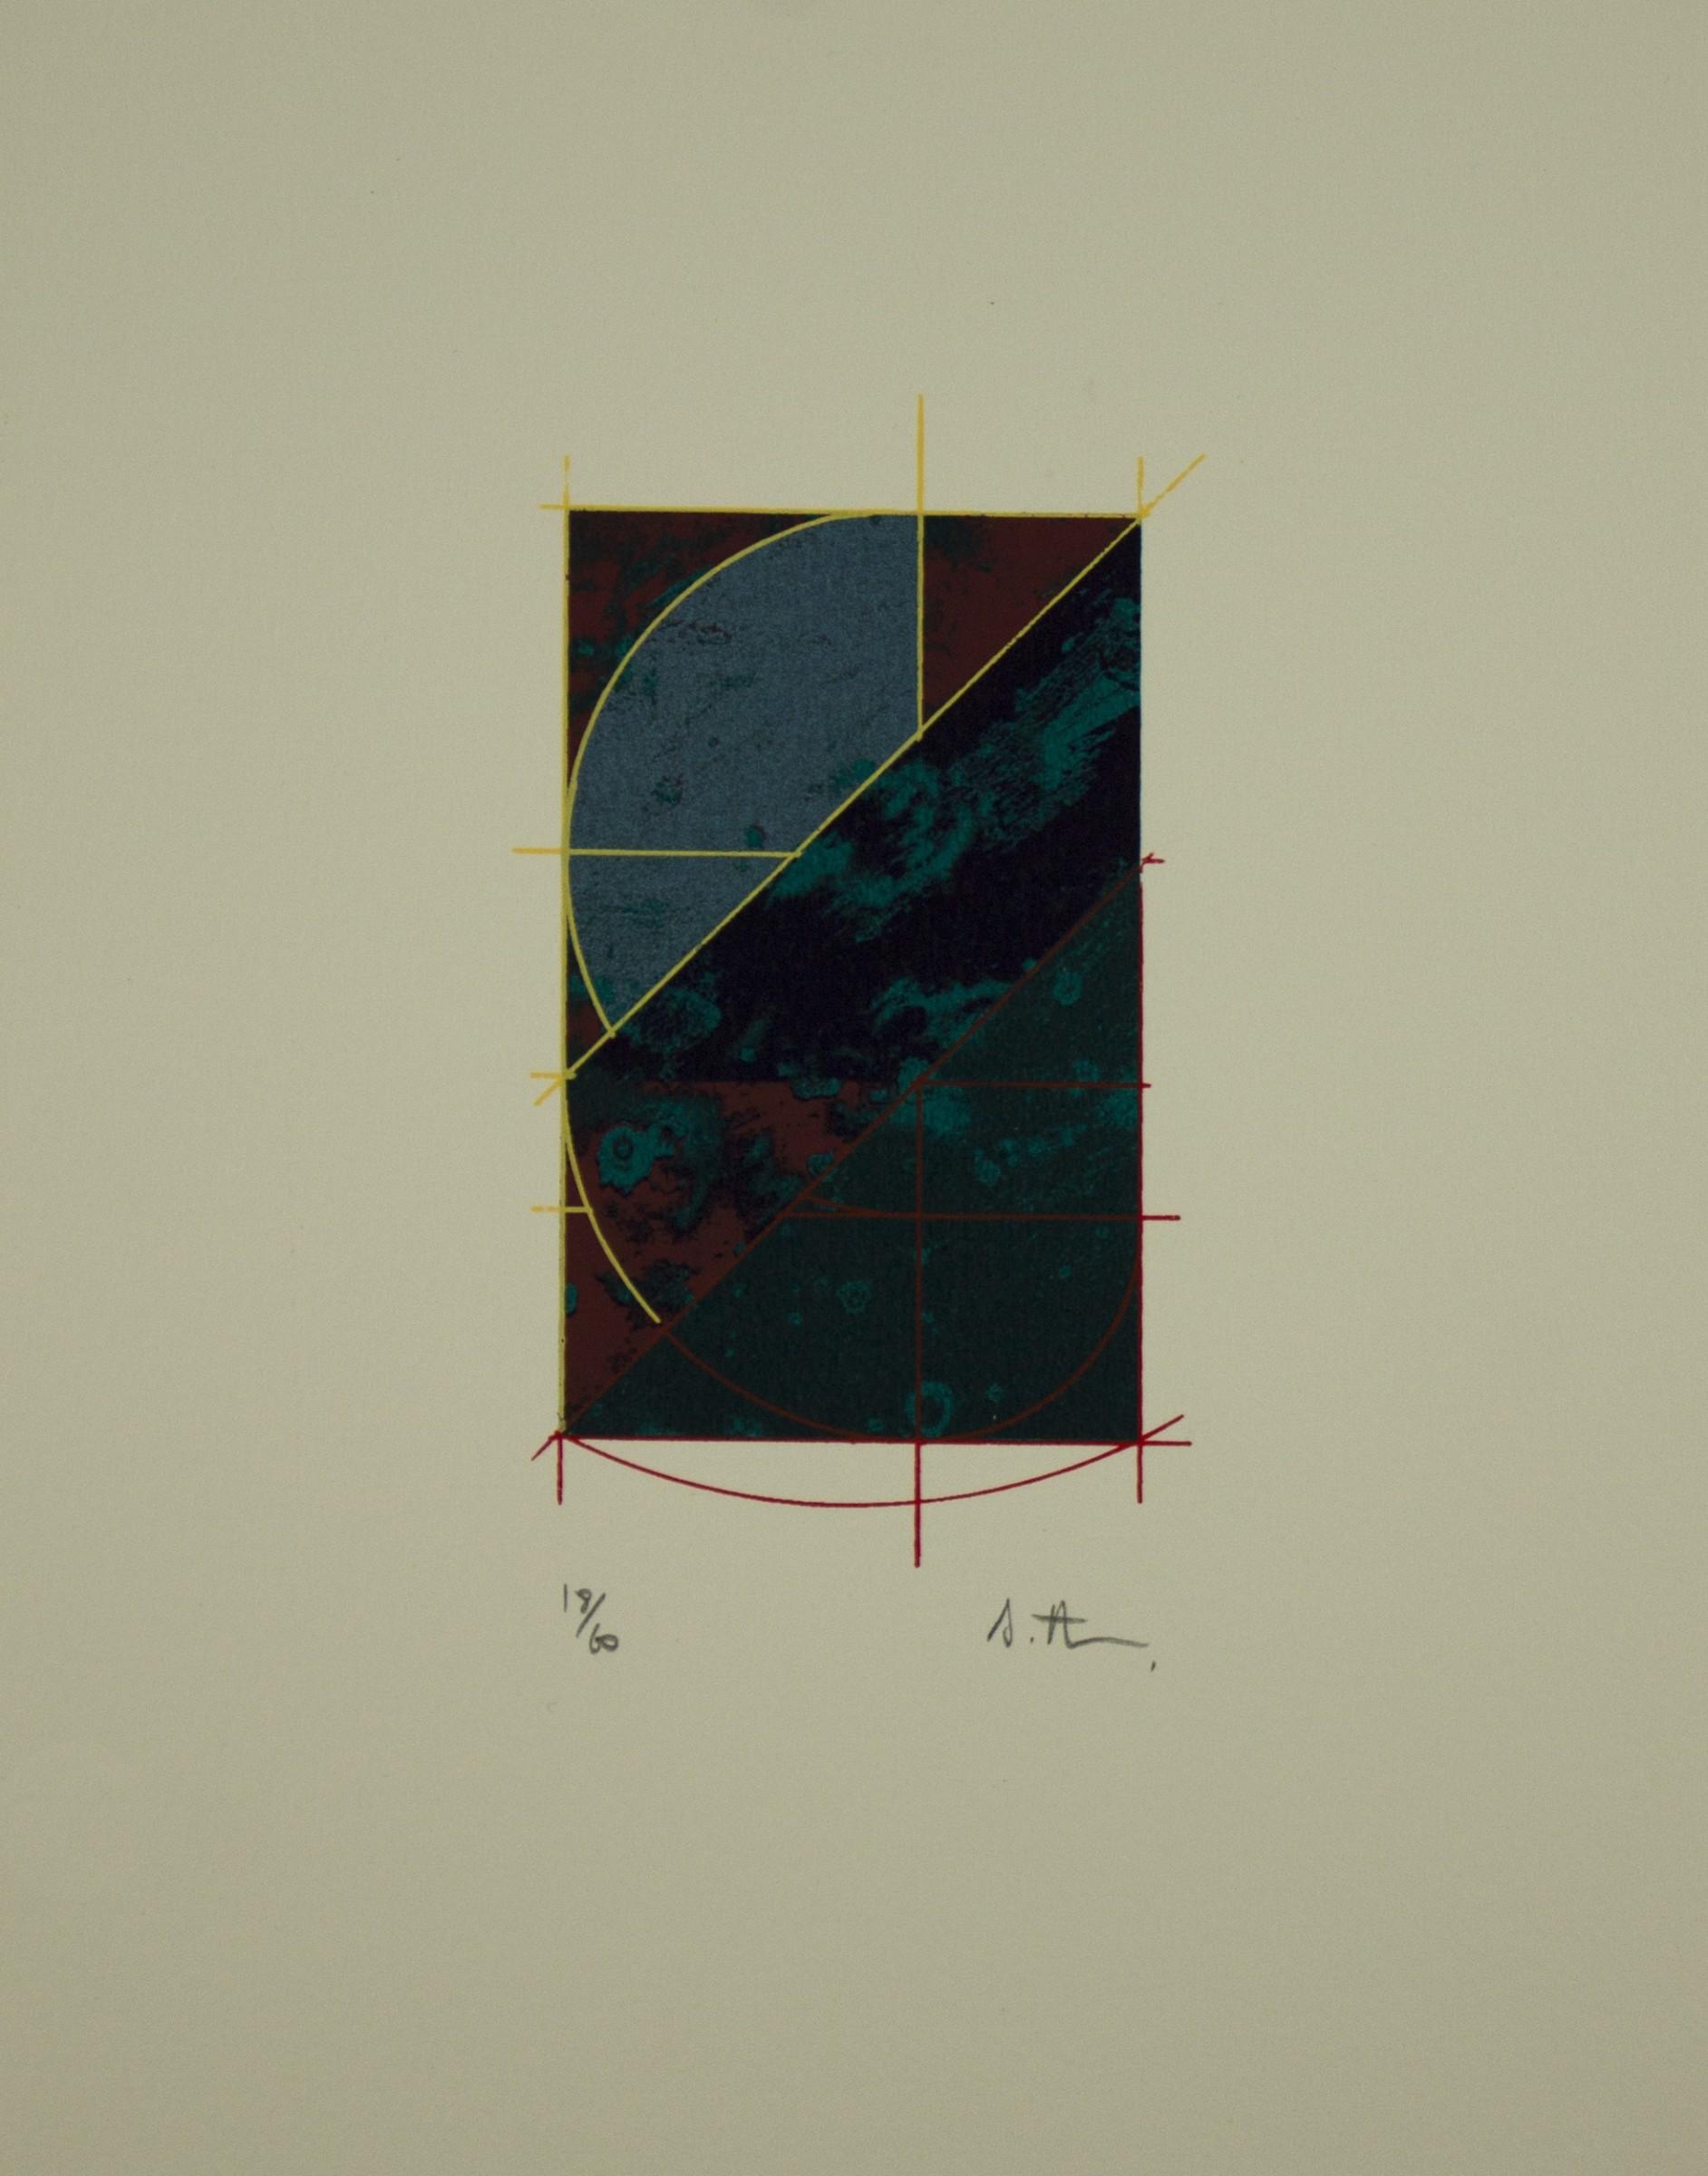 "<span class=""link fancybox-details-link""><a href=""/exhibitions/23/works/artworks_standalone11252/"">View Detail Page</a></span><div class=""artist""><span class=""artist""><strong>Stephen Hoskins RE</strong></span></div><div class=""title""><em>Golden Section 5</em></div><div class=""medium"">screenprint</div><div class=""dimensions"">25 x 20cm </div><div class=""edition_details"">edition of 60</div>"